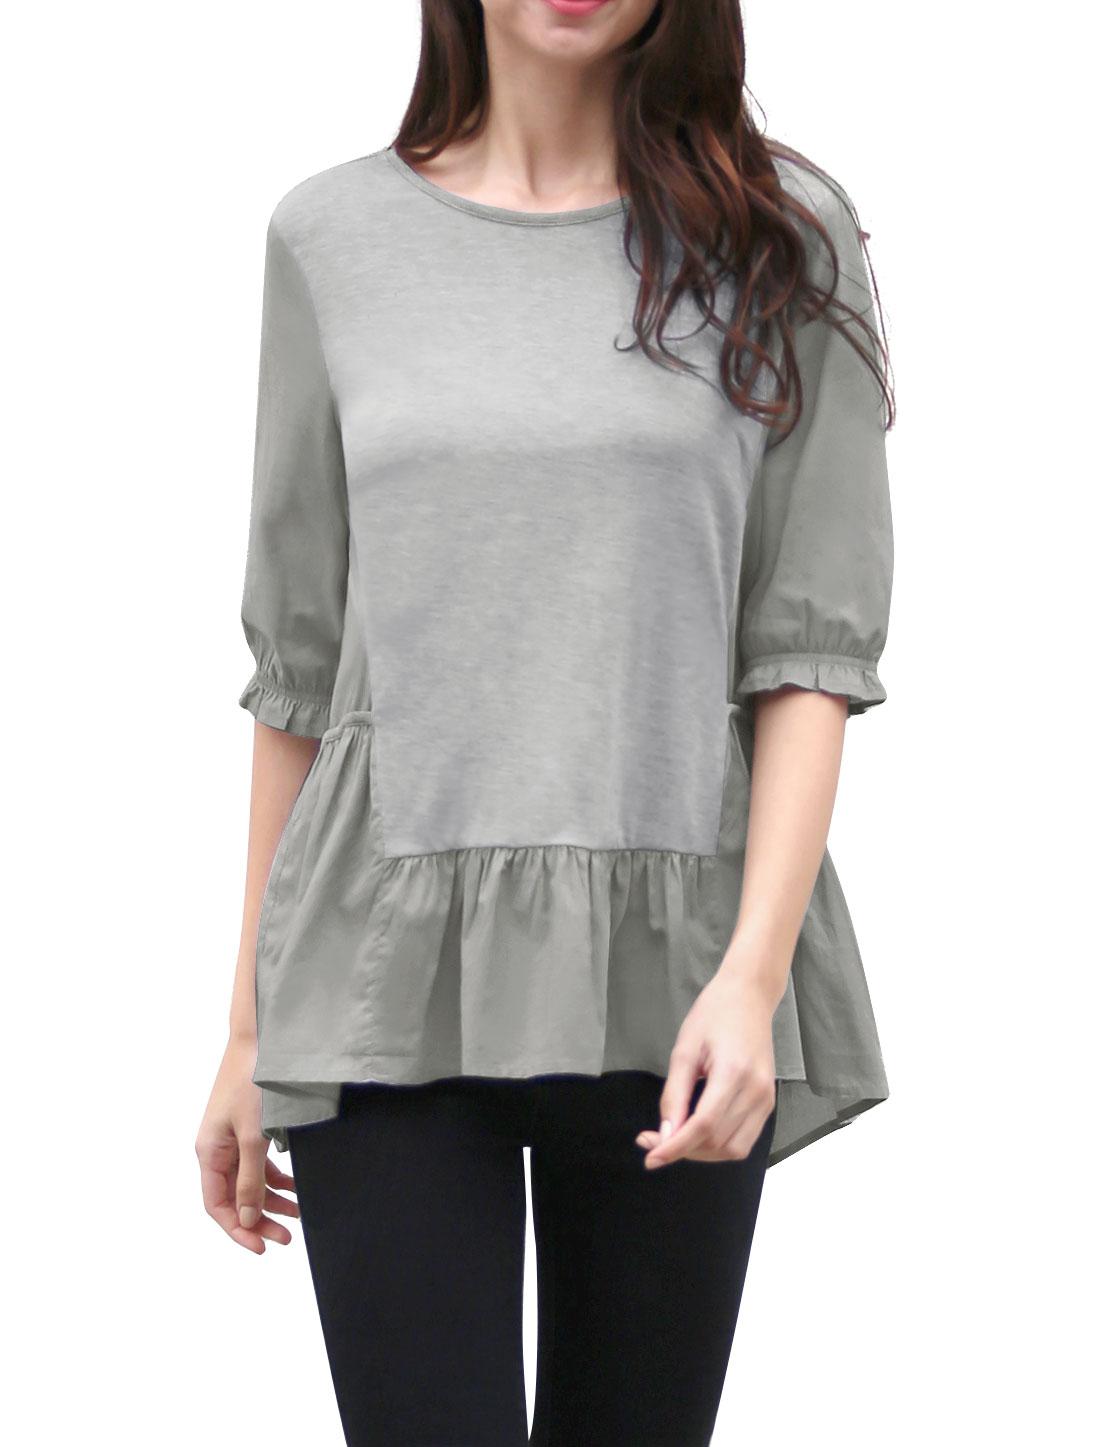 Women Ruffled High-Low Hem 1/2 Sleeves Paneled Tunic Top Gray XS